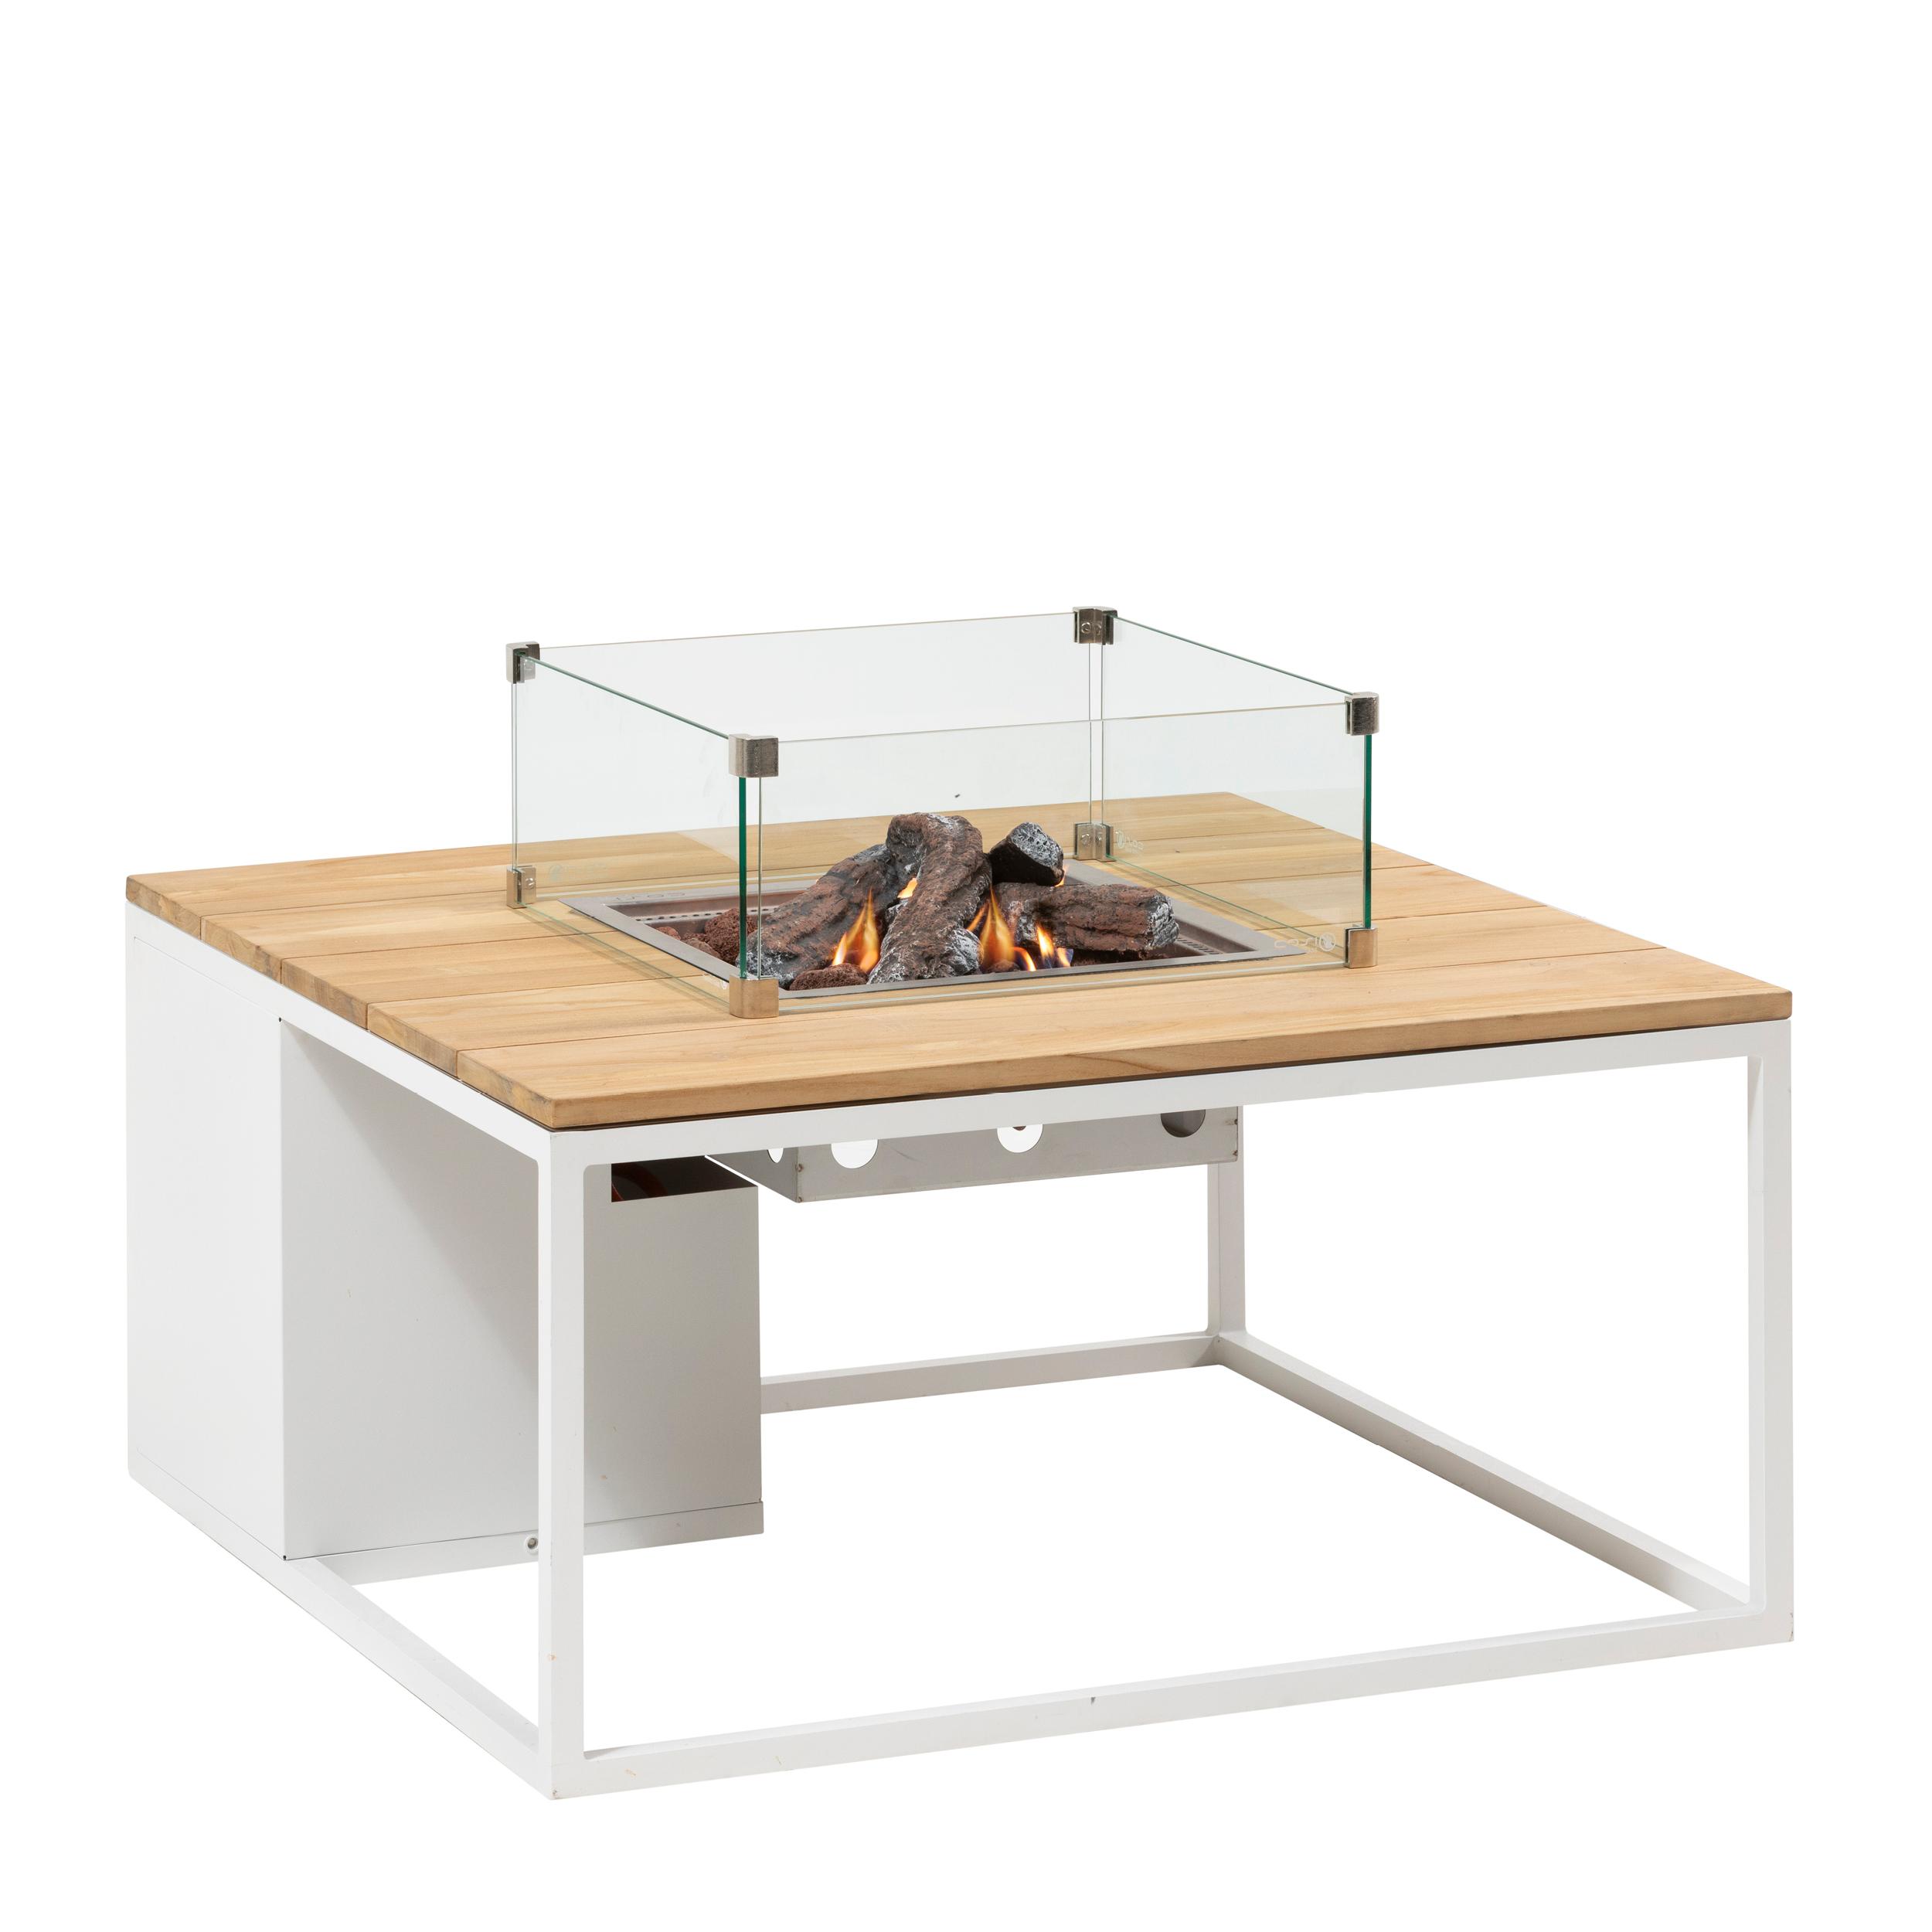 5957890 - Cosiloft 100 lounge table white-teak - glass - side